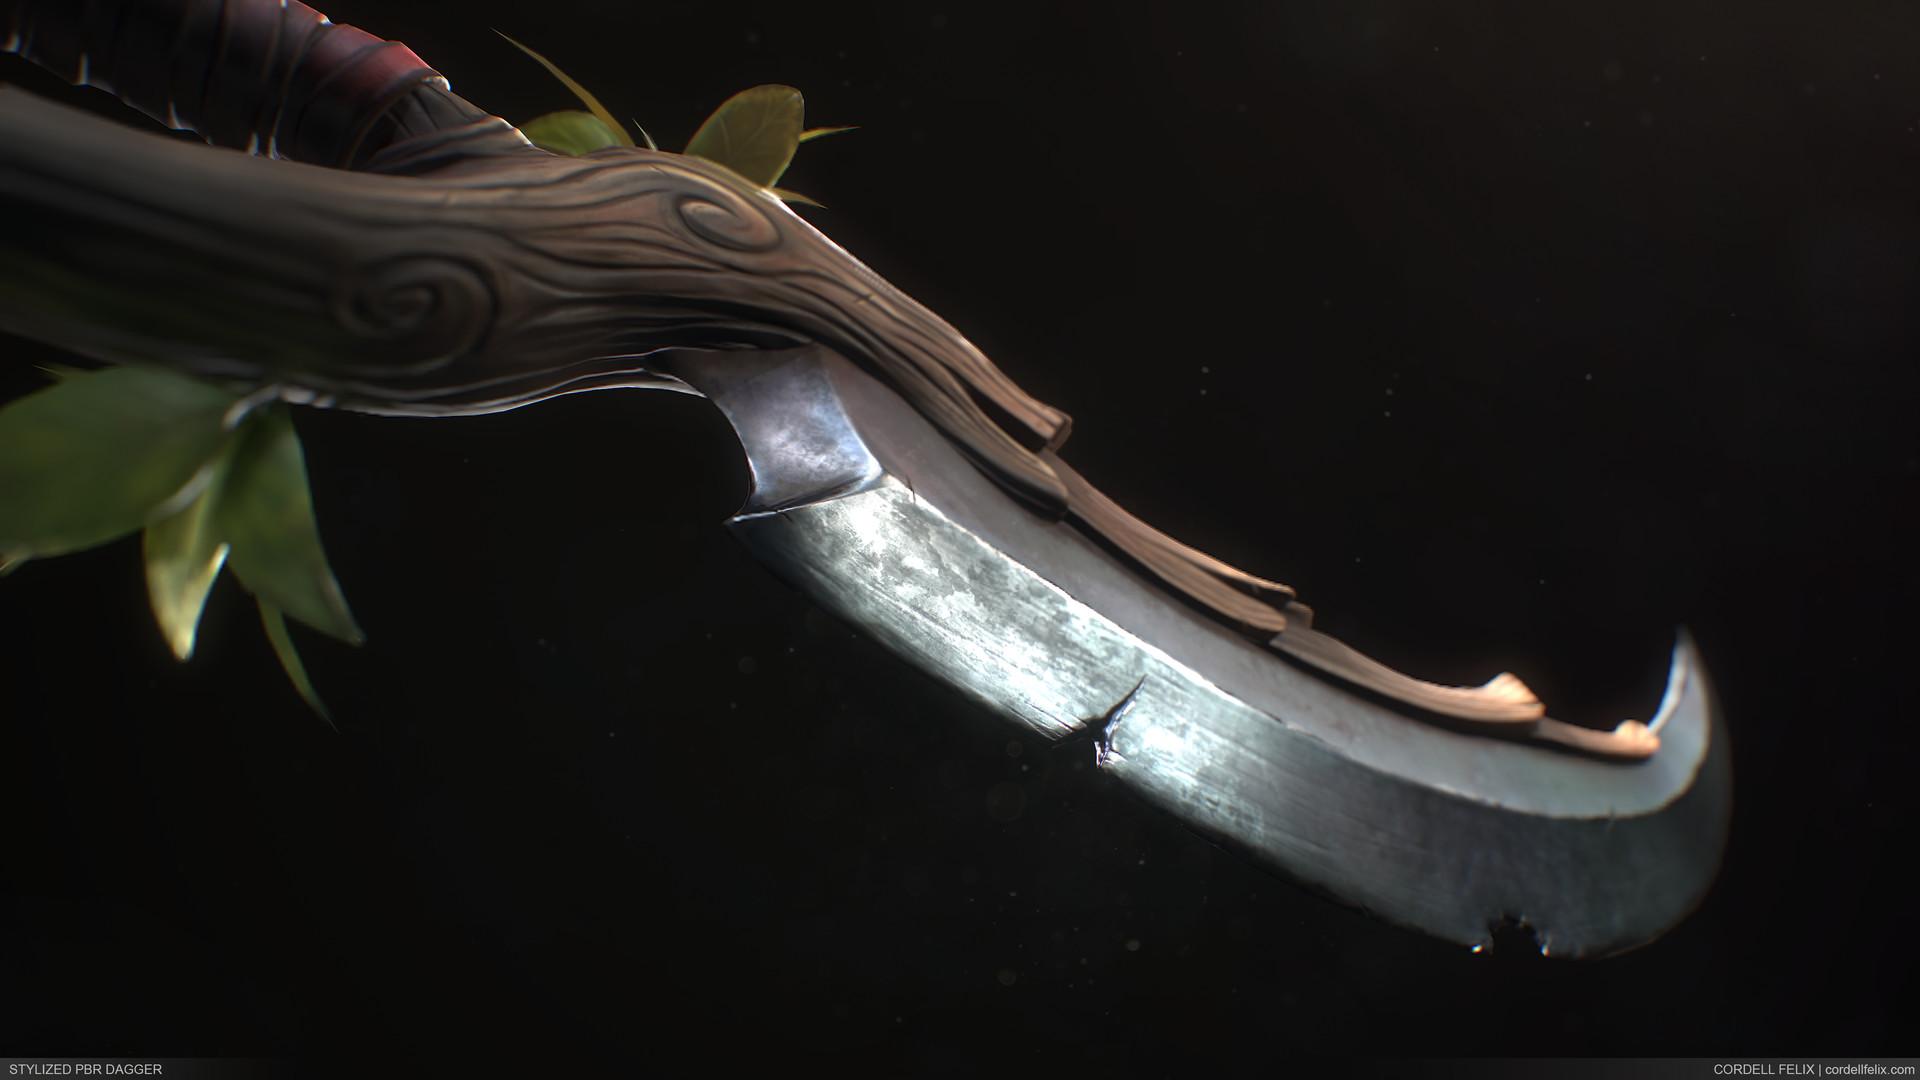 Cordell felix cordellfelix dagger 06